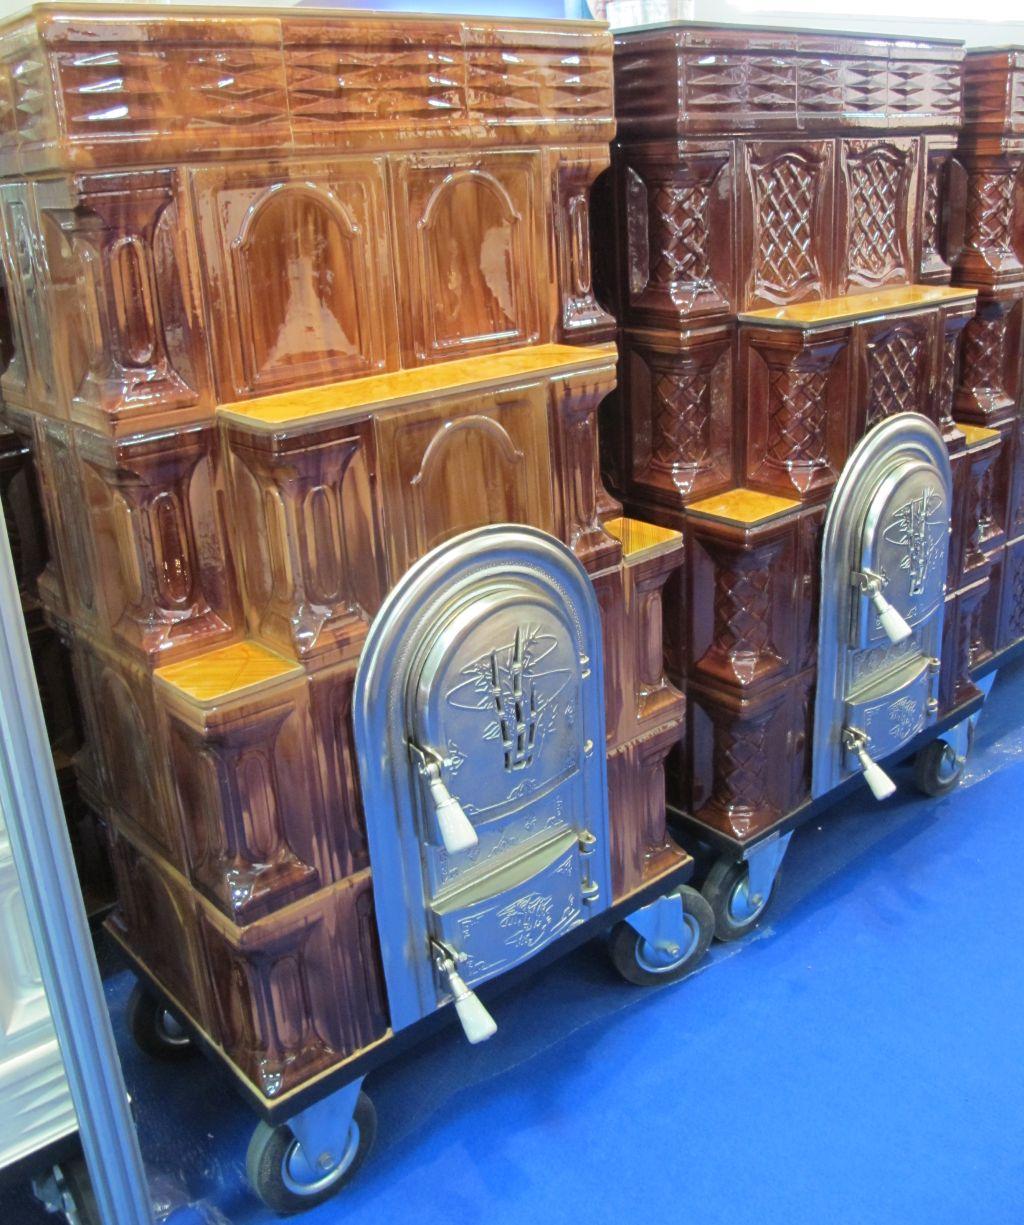 Sobe din teracota pe roti fabricate de FANCRIS